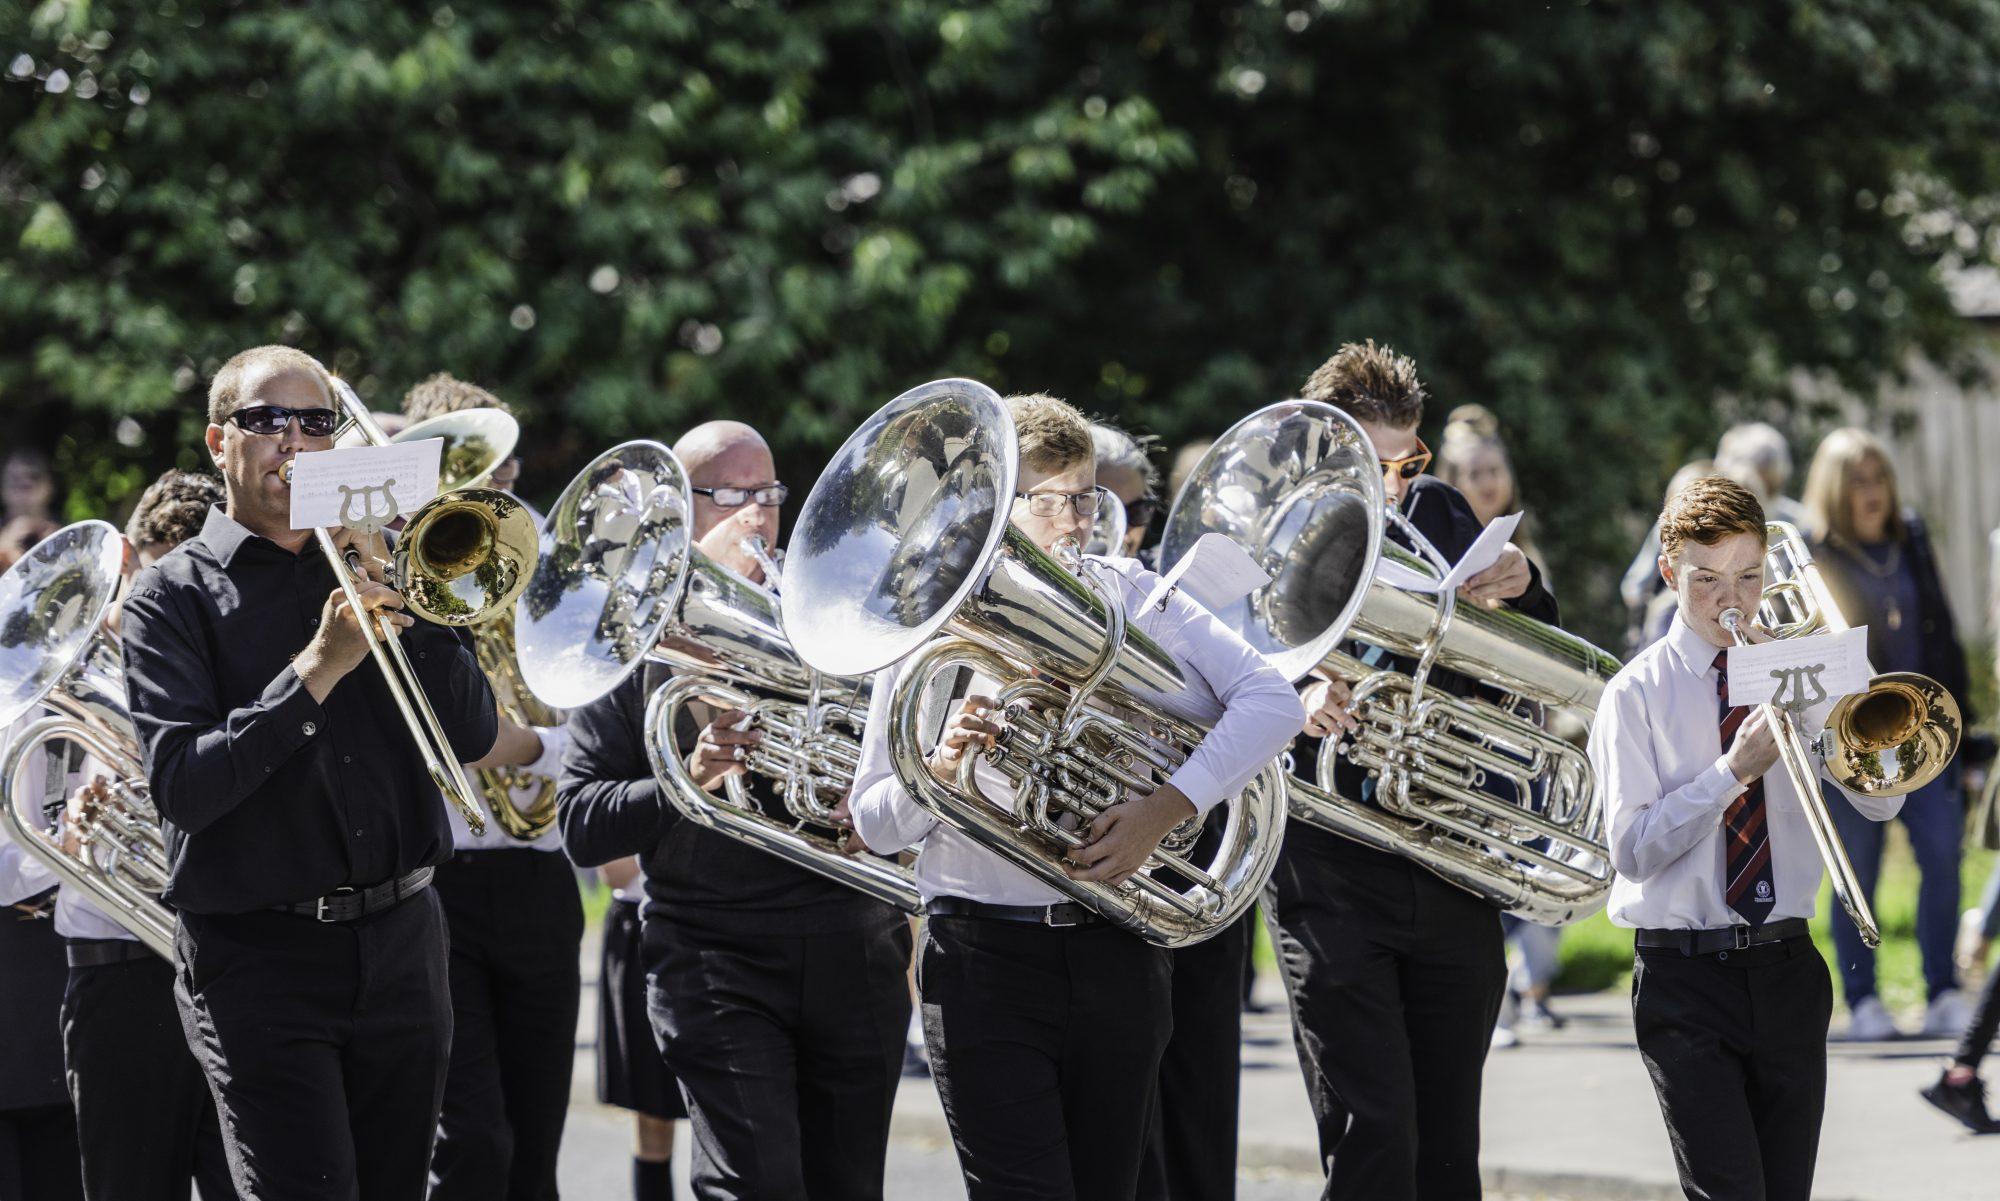 Whitworth Vale and Healey Band